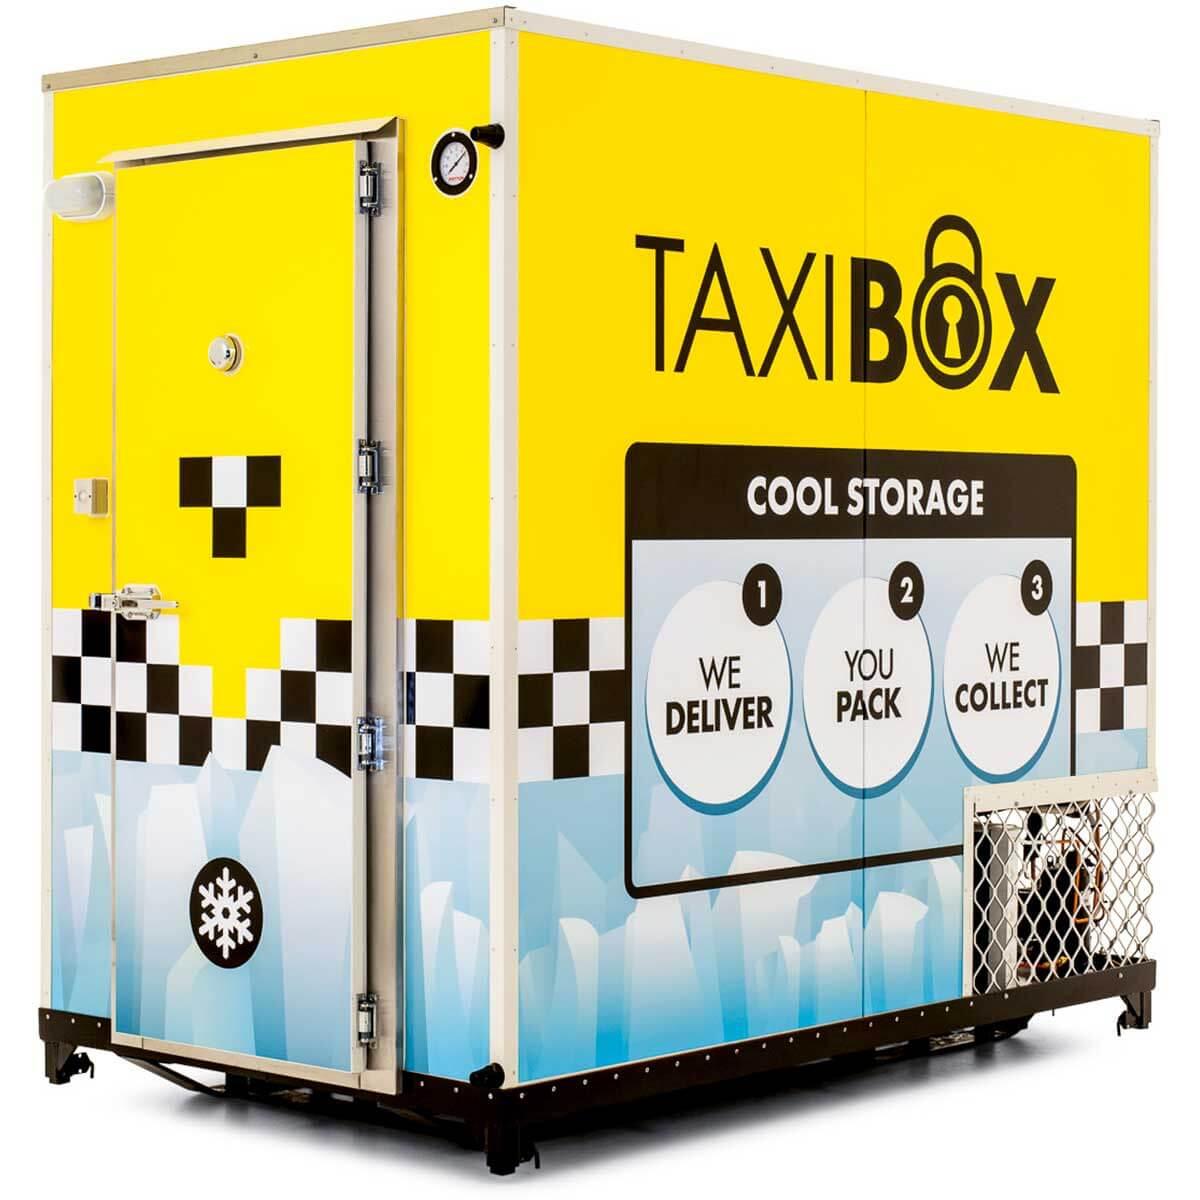 TAXIBOX Cool Storage